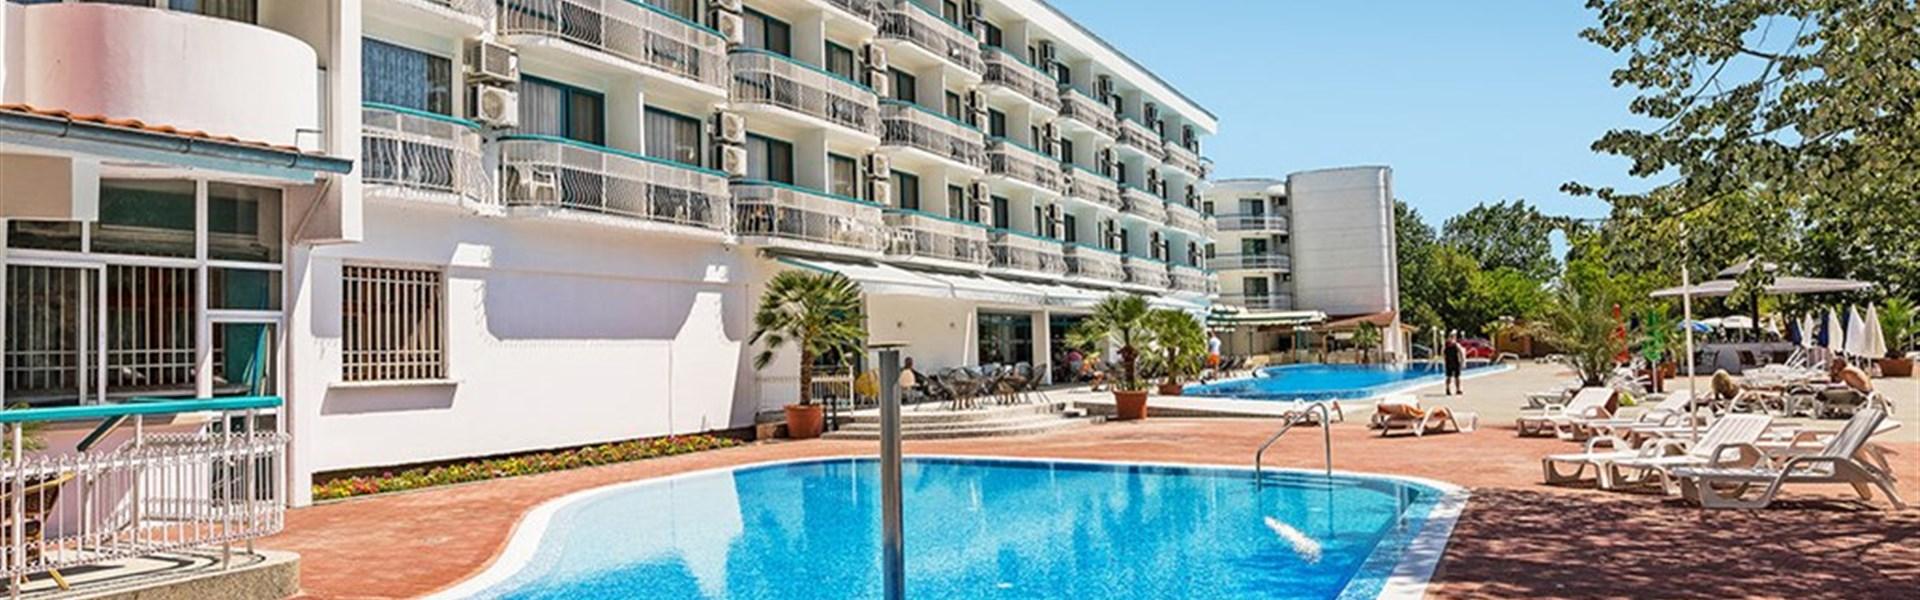 Marco Polo - Hotel Zefir Beach -